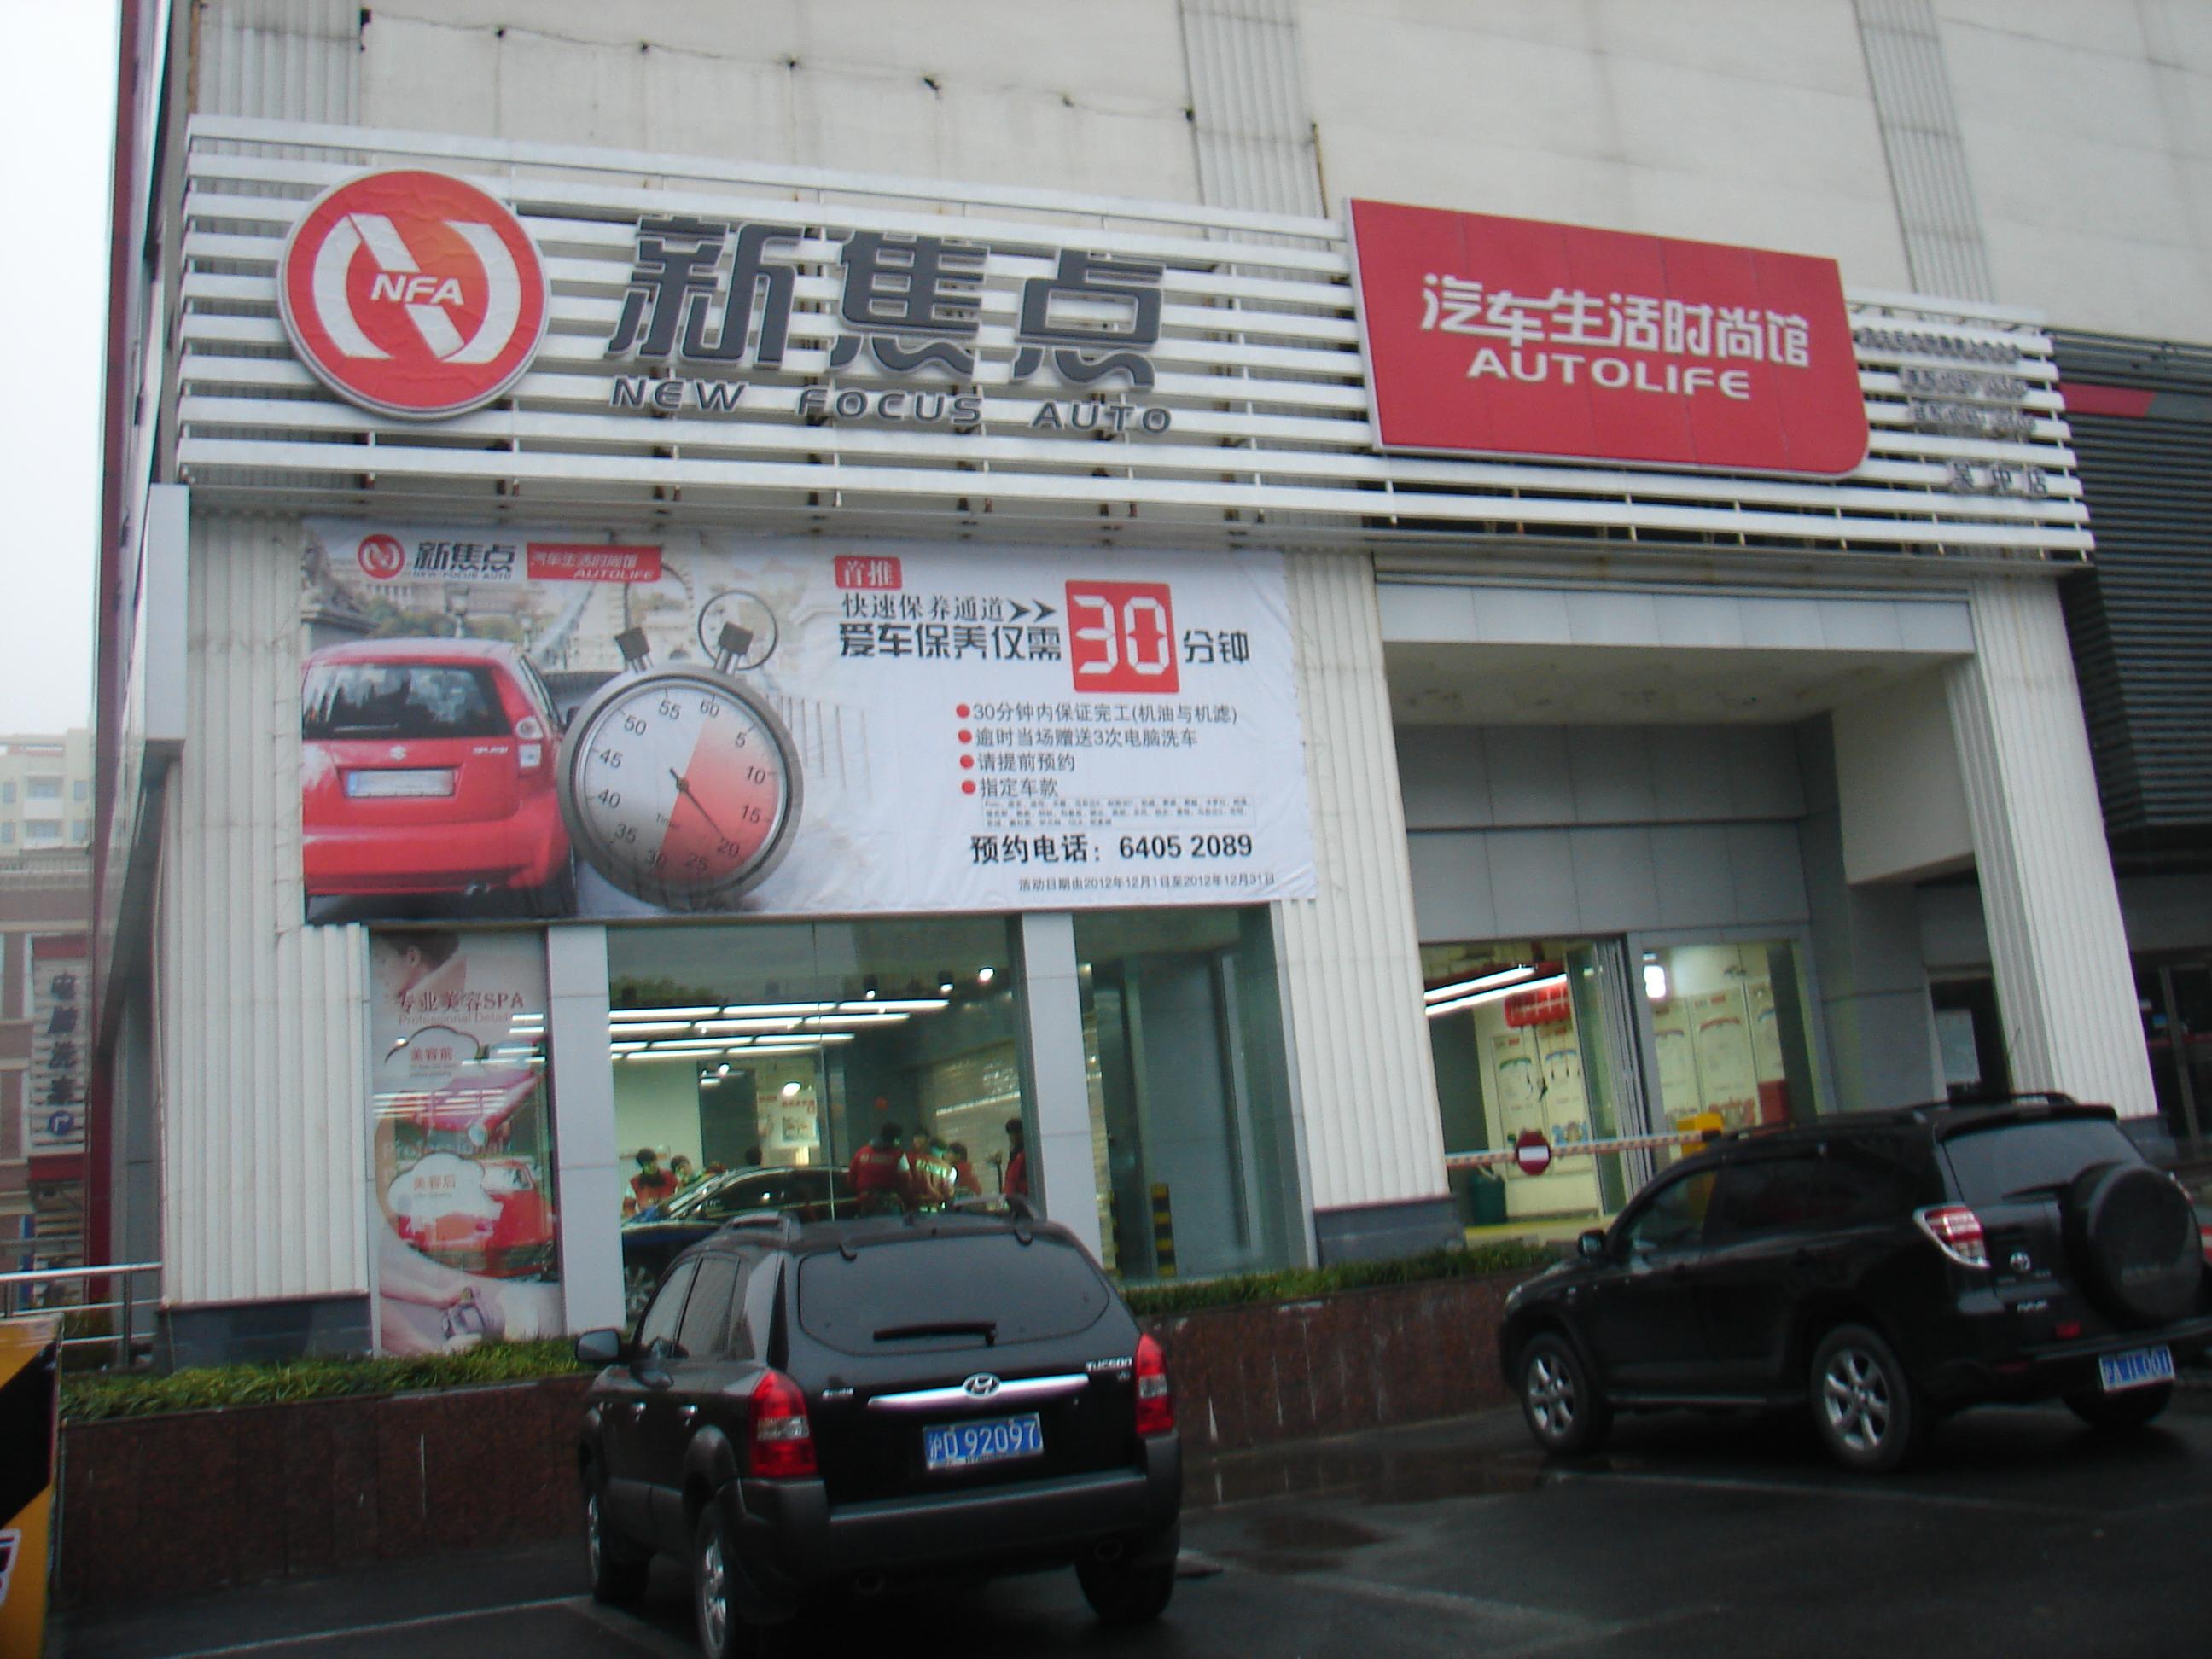 TDR新焦點汽車,上海吳中路店。(記者Jimi Liao 攝影)